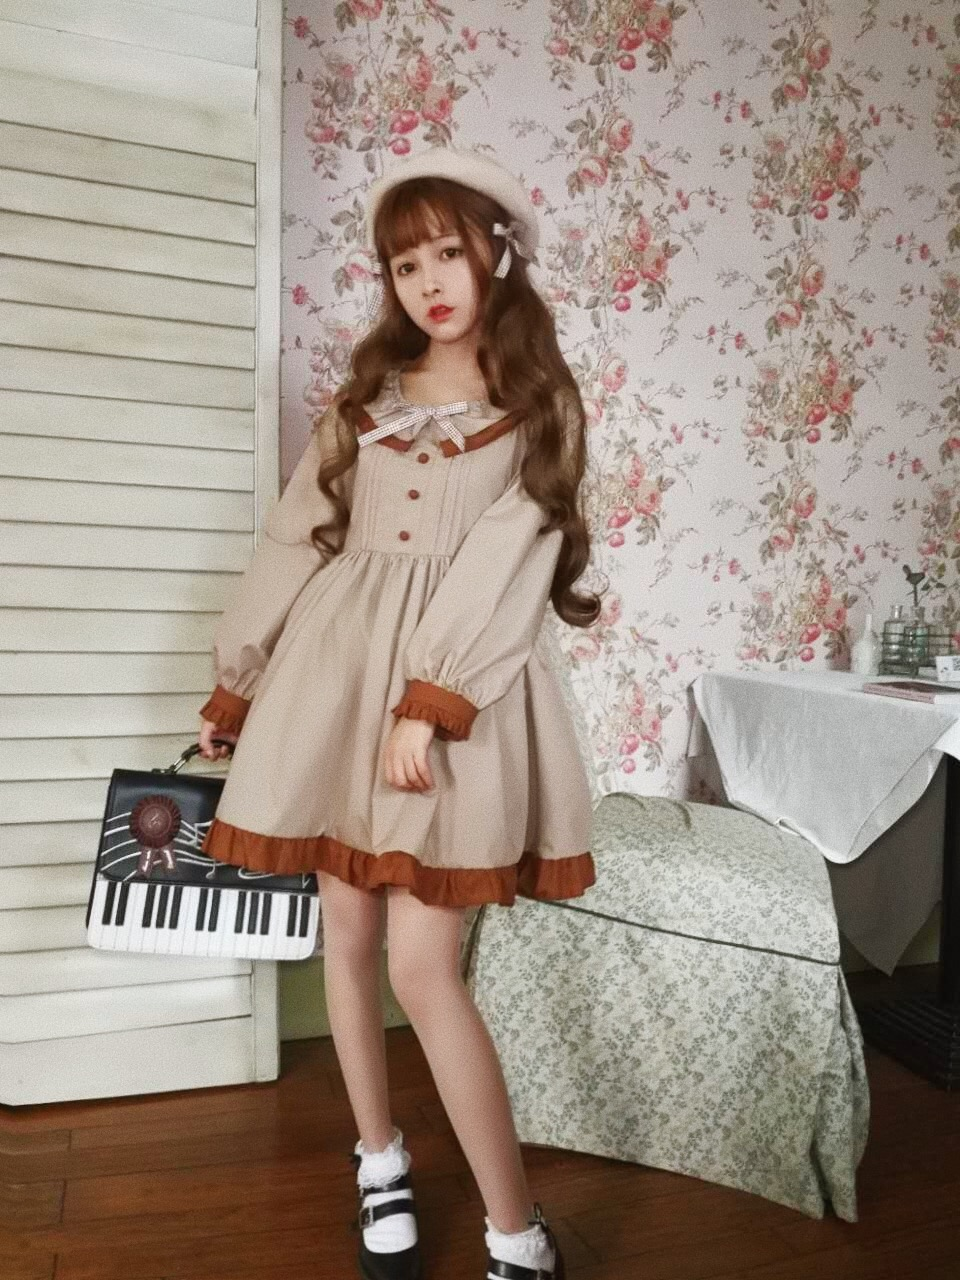 Japanese palace sweet lolita derss vintage o-neck bowknot victorian dress kawaii girl gothic lolita op loli cos